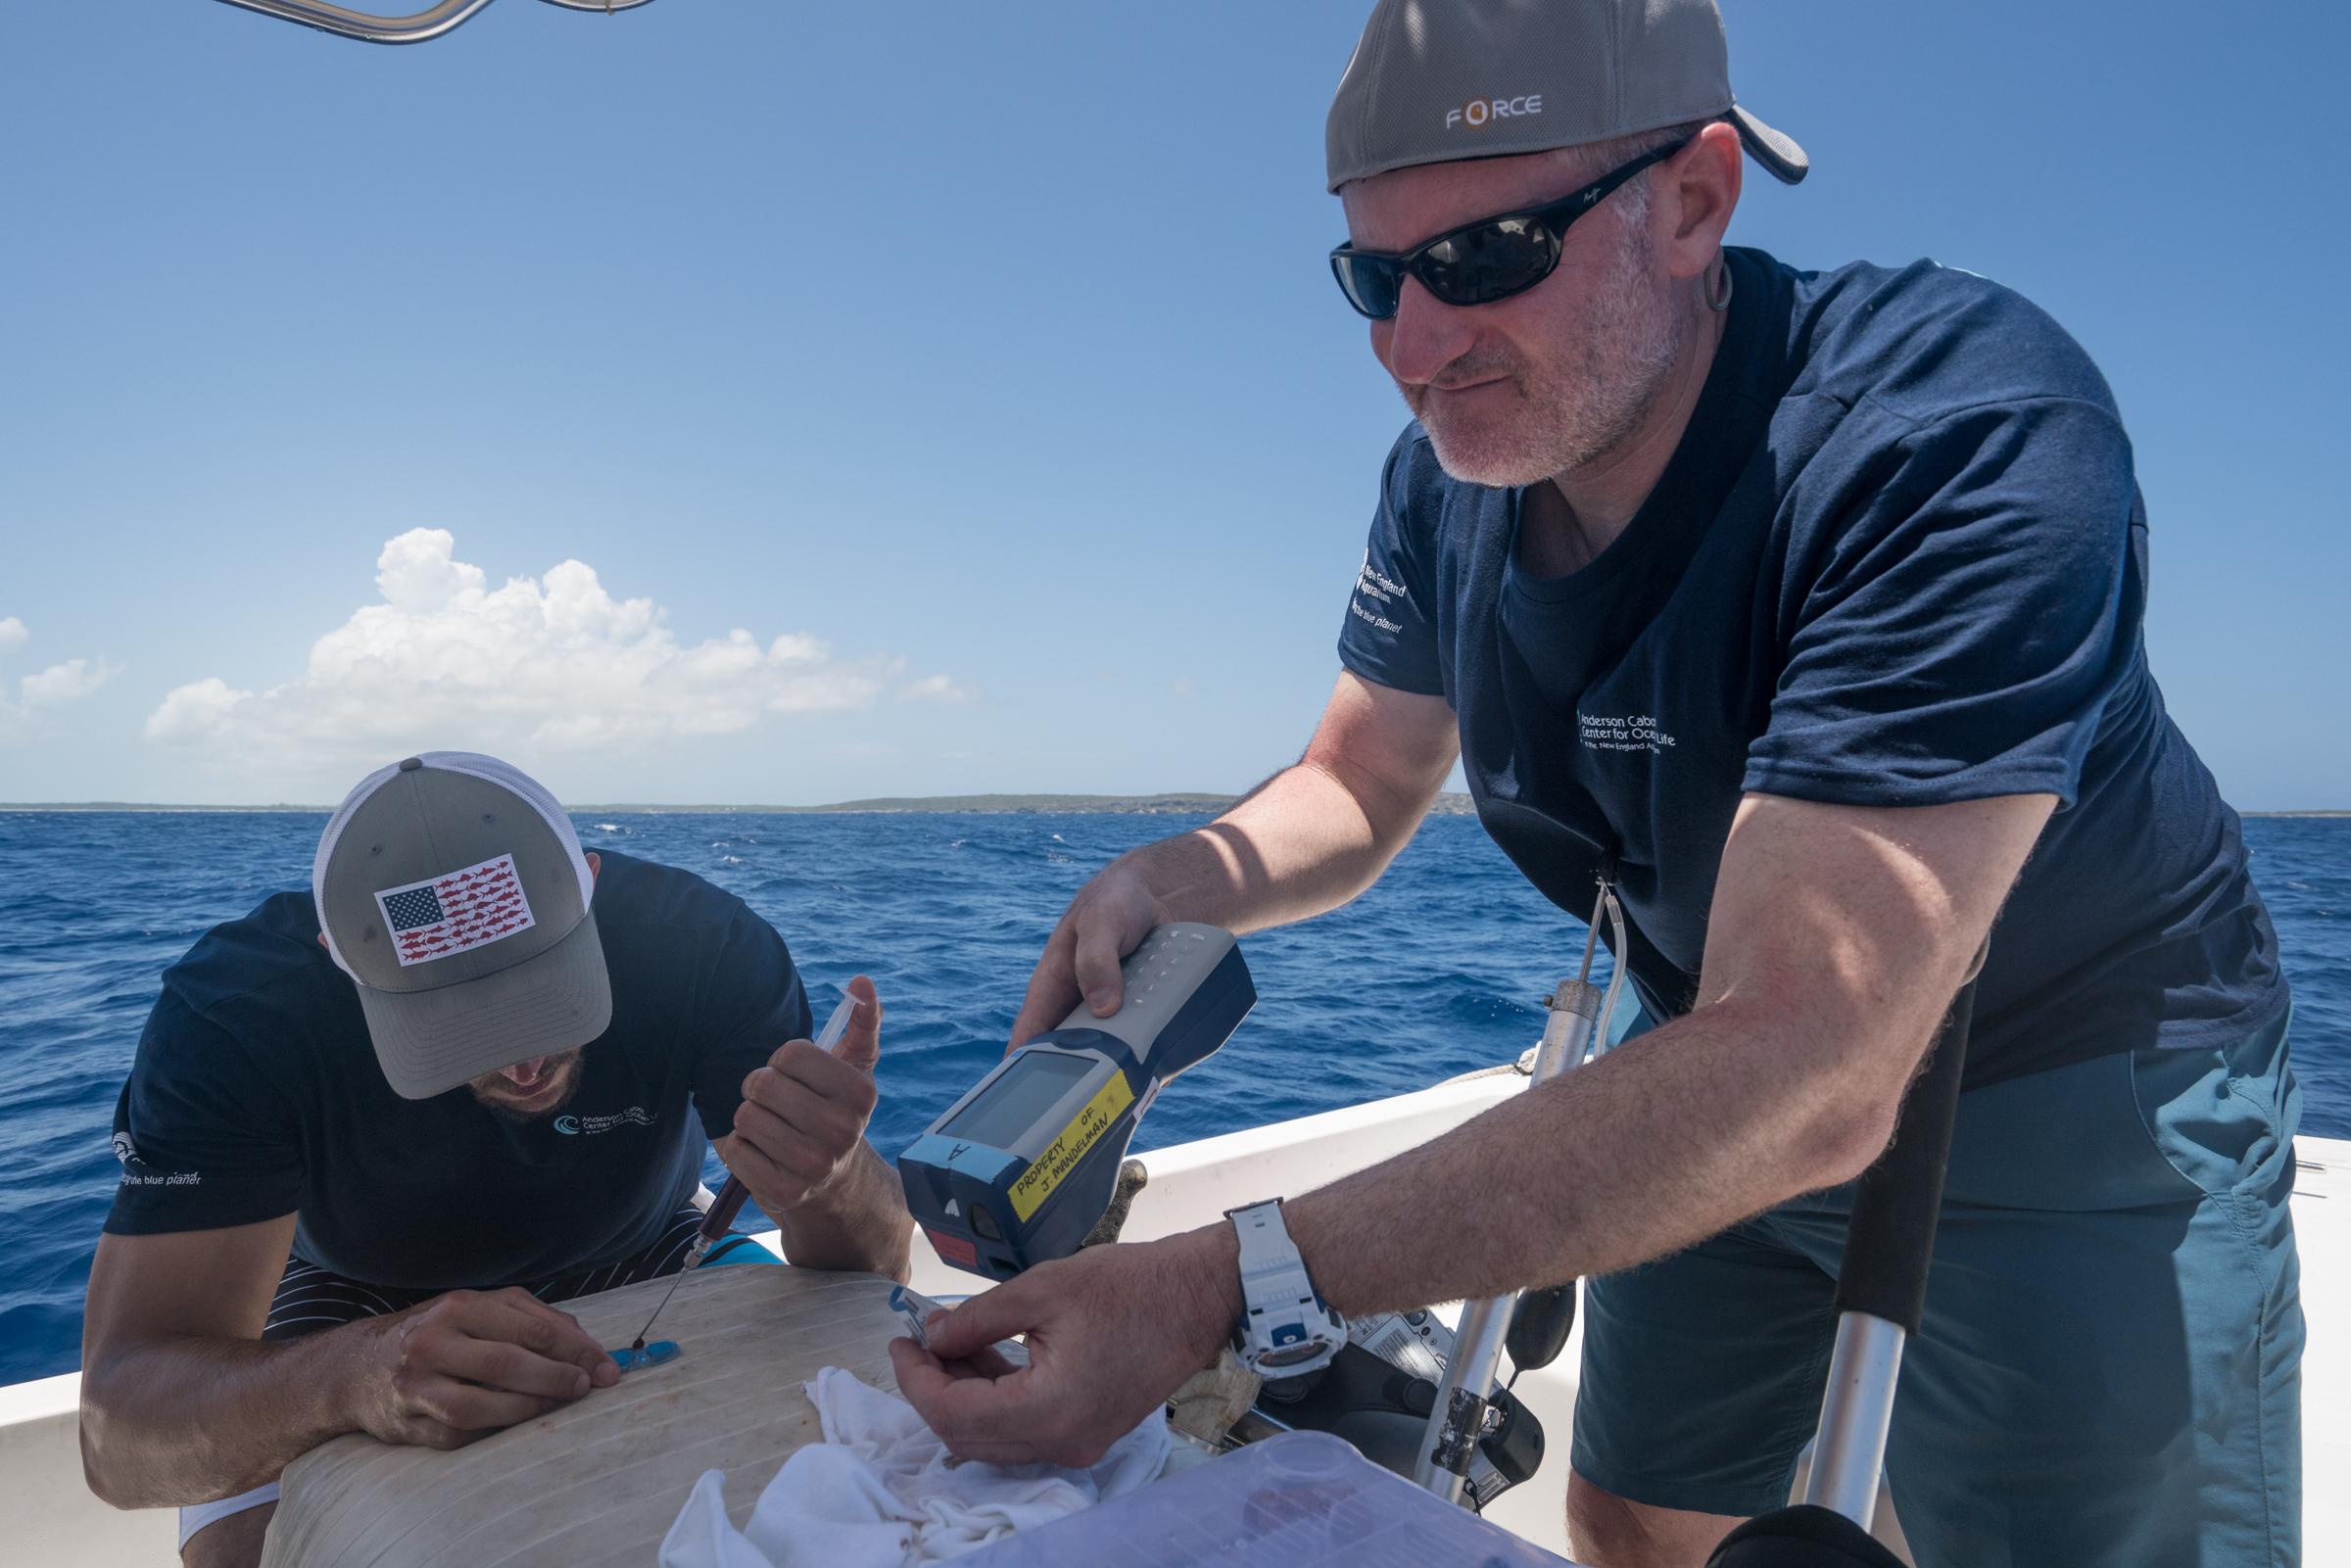 John Mandelman and Ryan Knotek process blood samples on the boat.